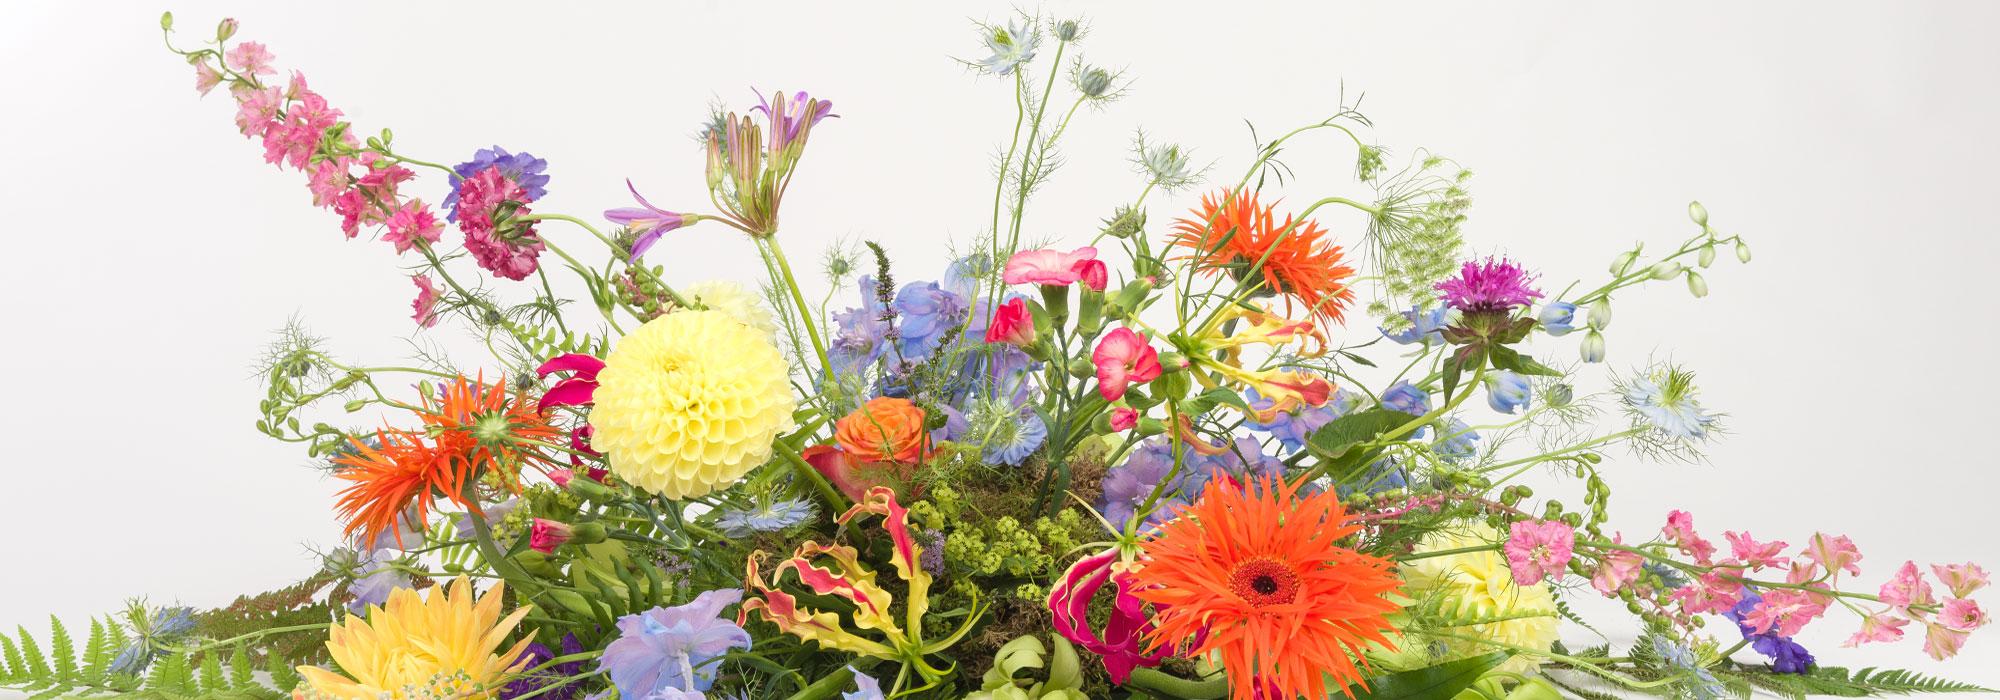 bloemenfee-slider-bloemstuk